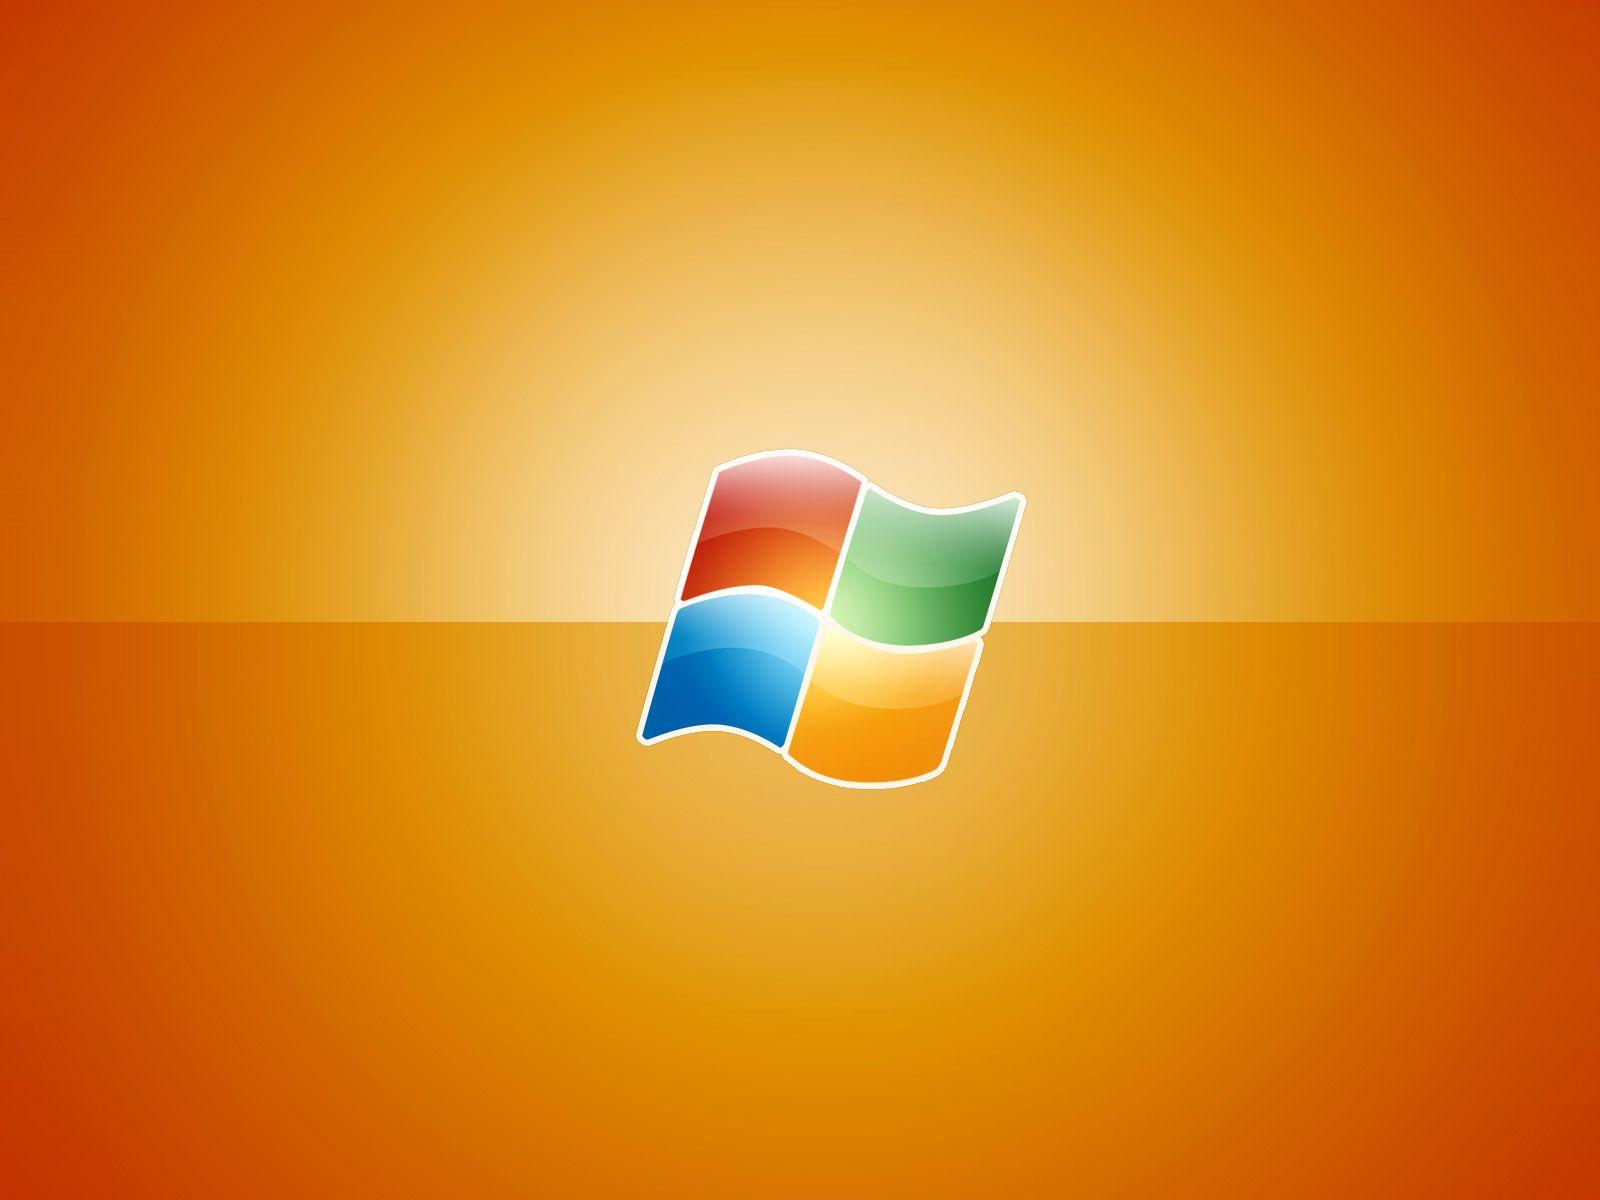 windows vista logo wallpaper wallpapersafari